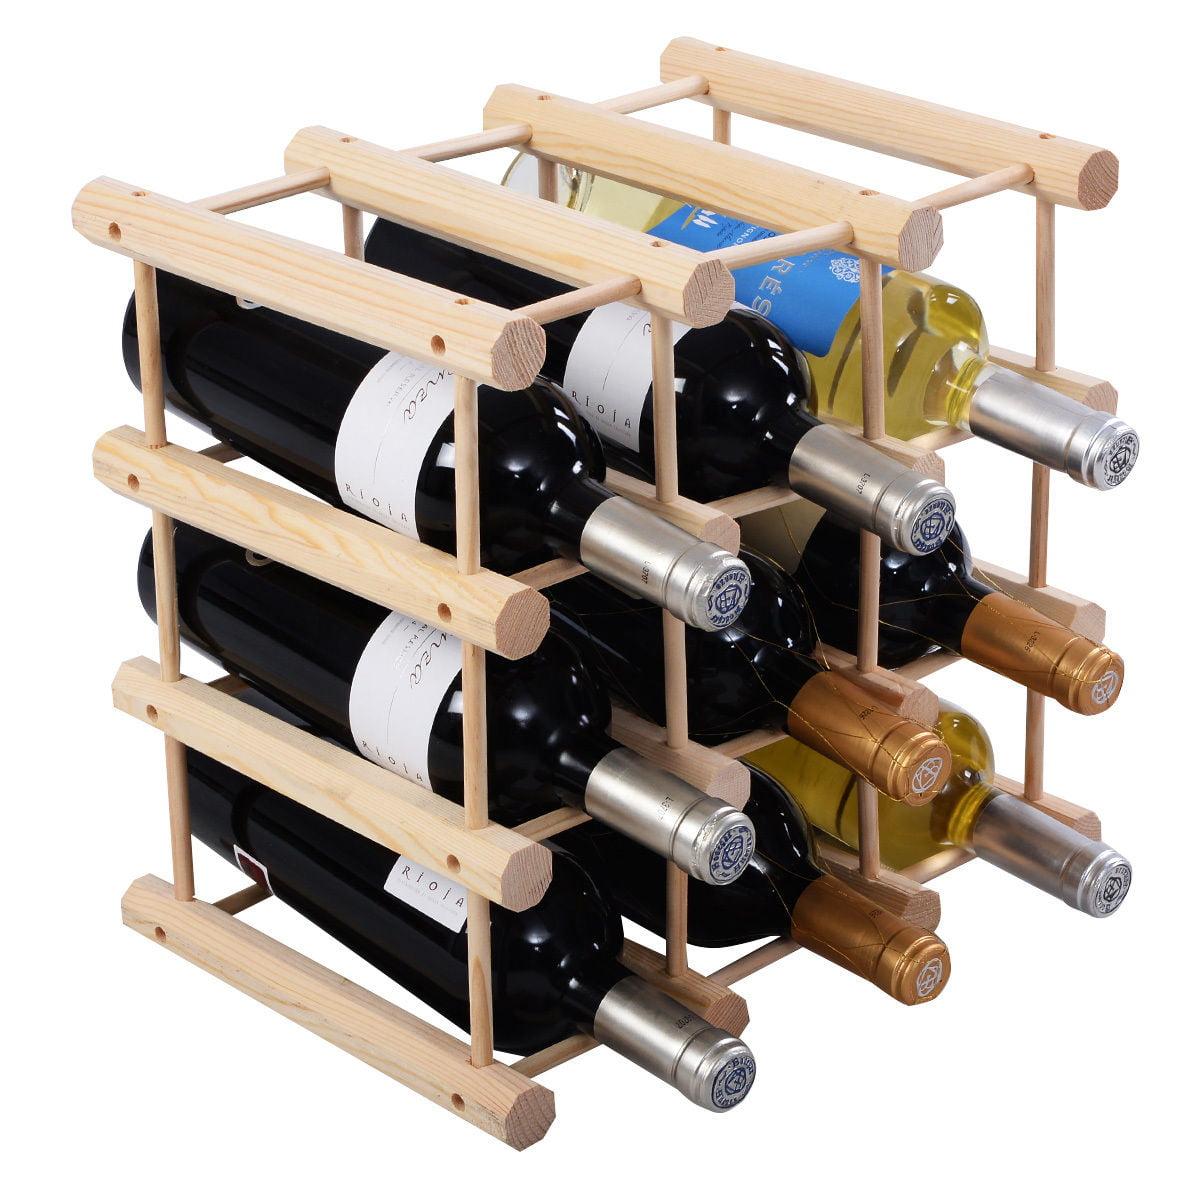 Costway 12 Bottle Wood Wine Rack Bottle Holder Storage Display Natural Kitchen by Costway